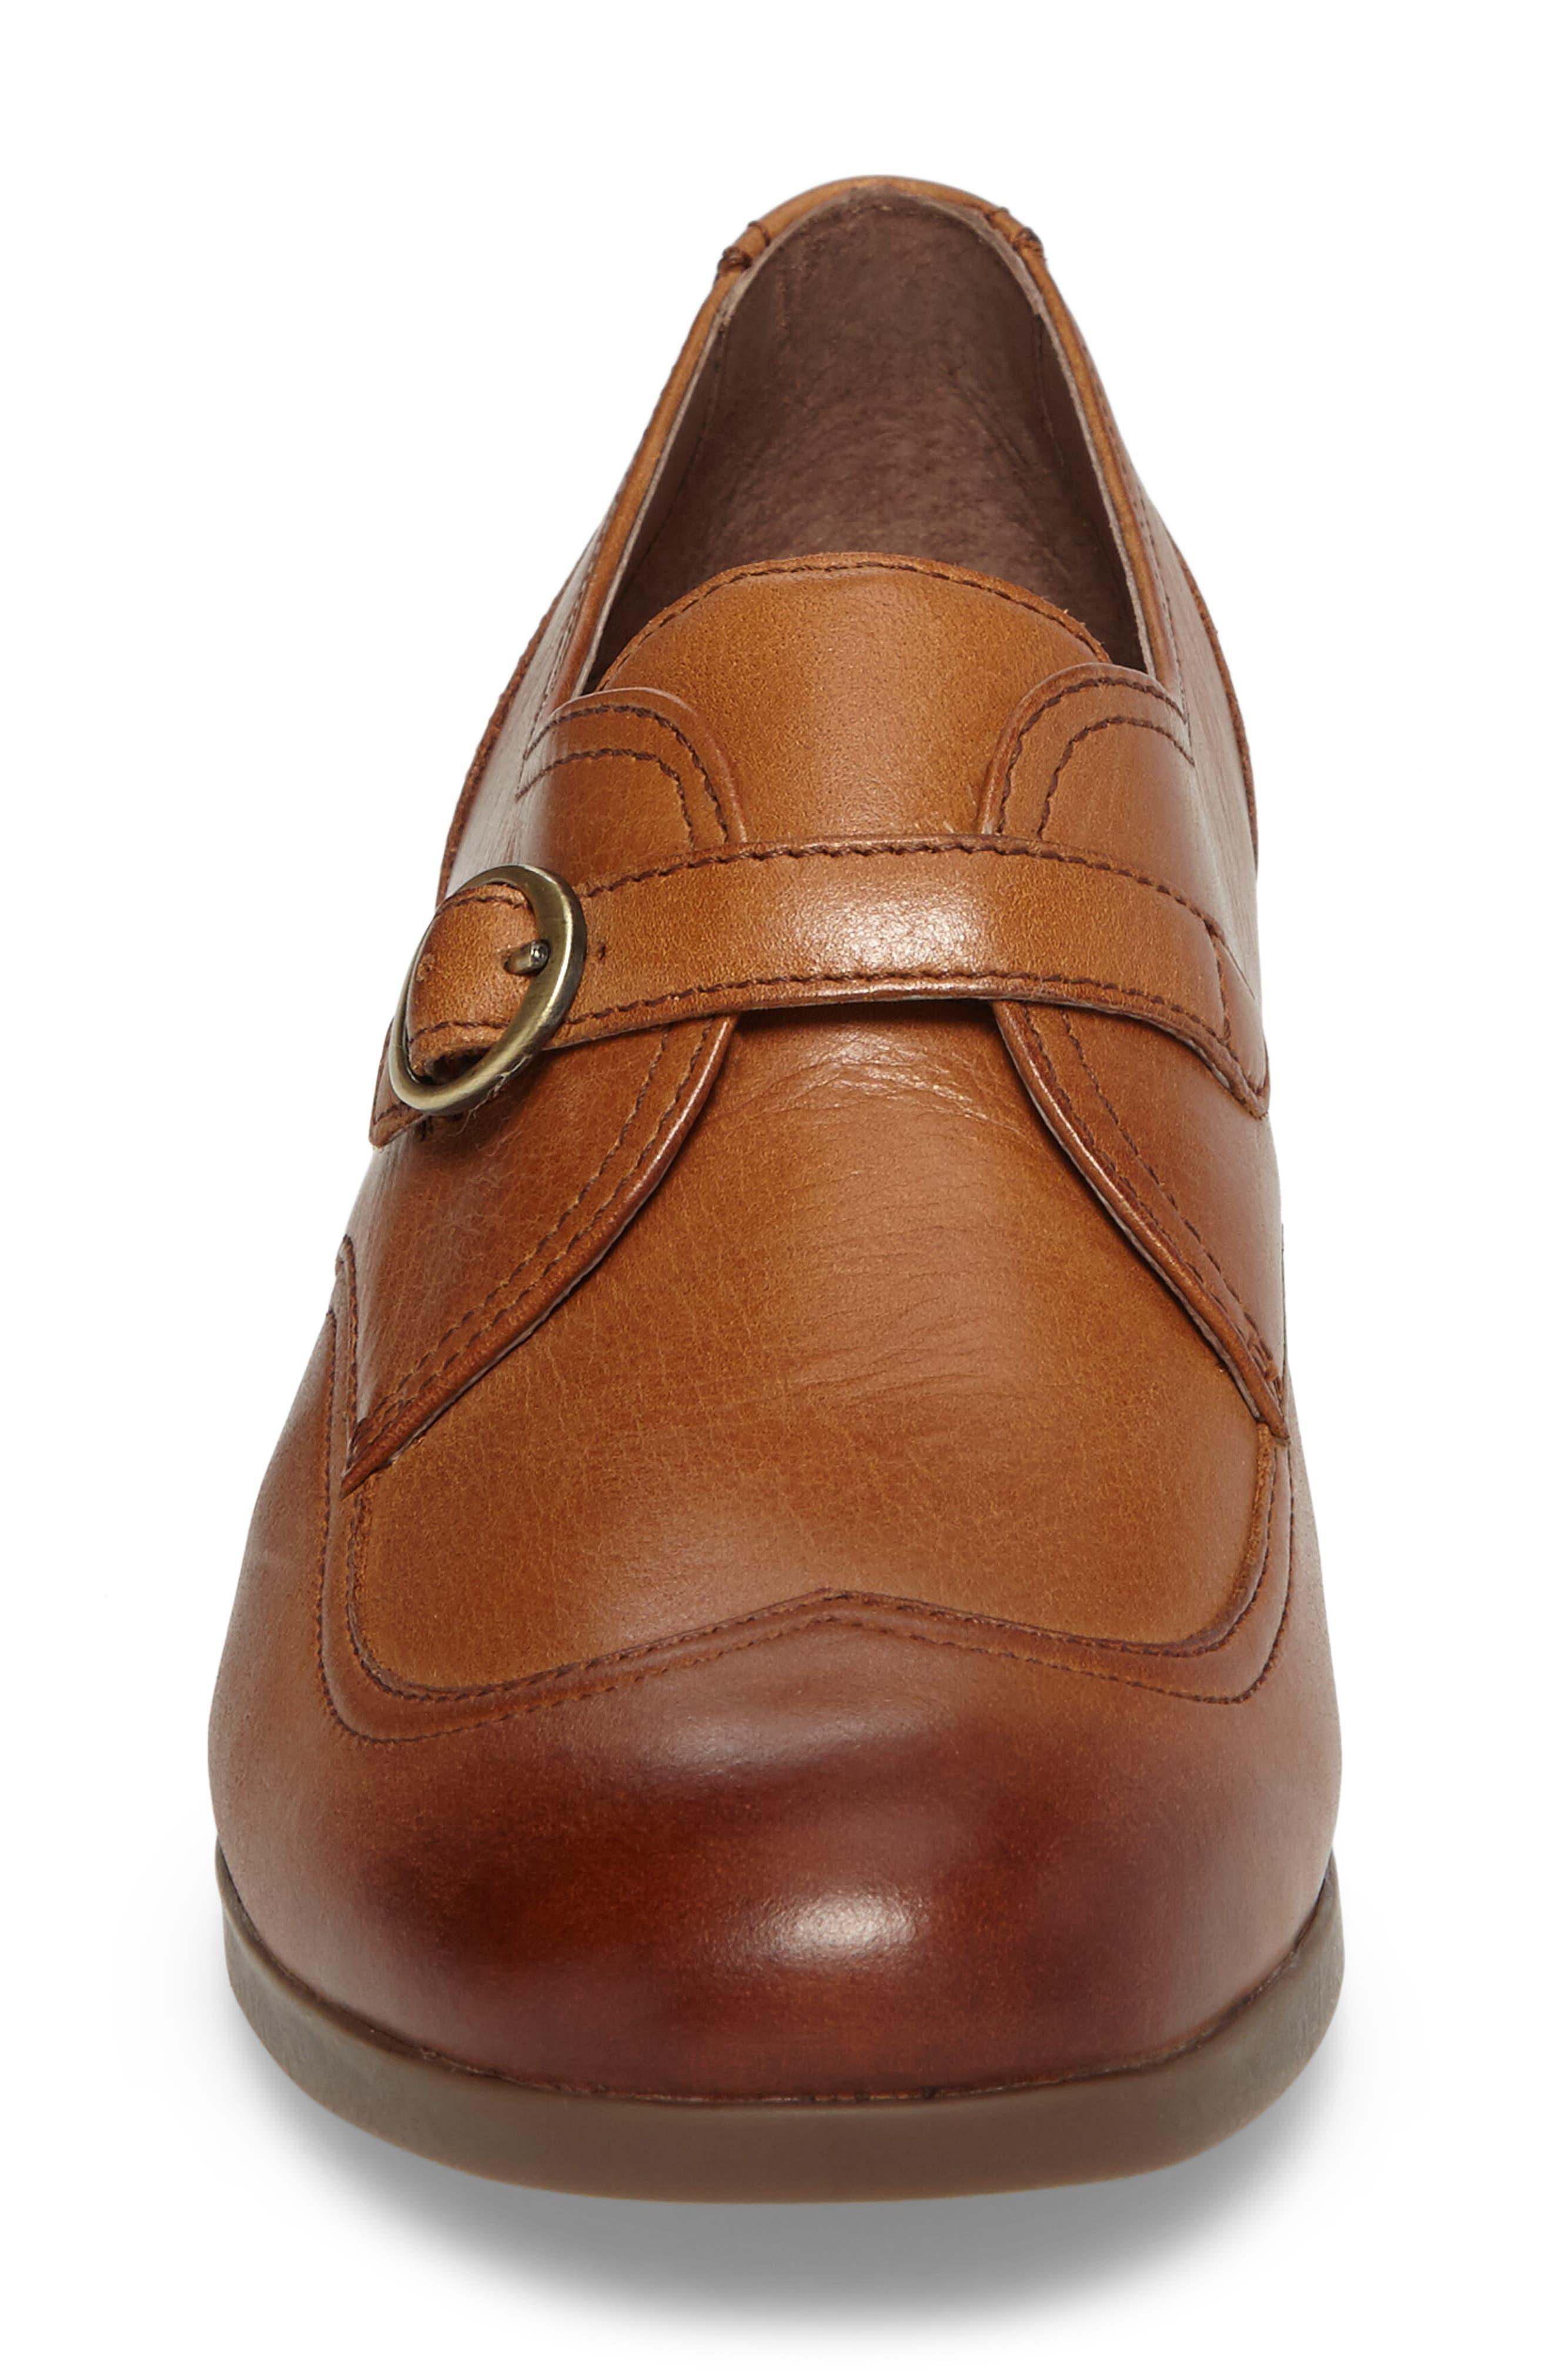 Livie Wingtip Oxford,                             Alternate thumbnail 4, color,                             Saddle Burnished Nappa Leather